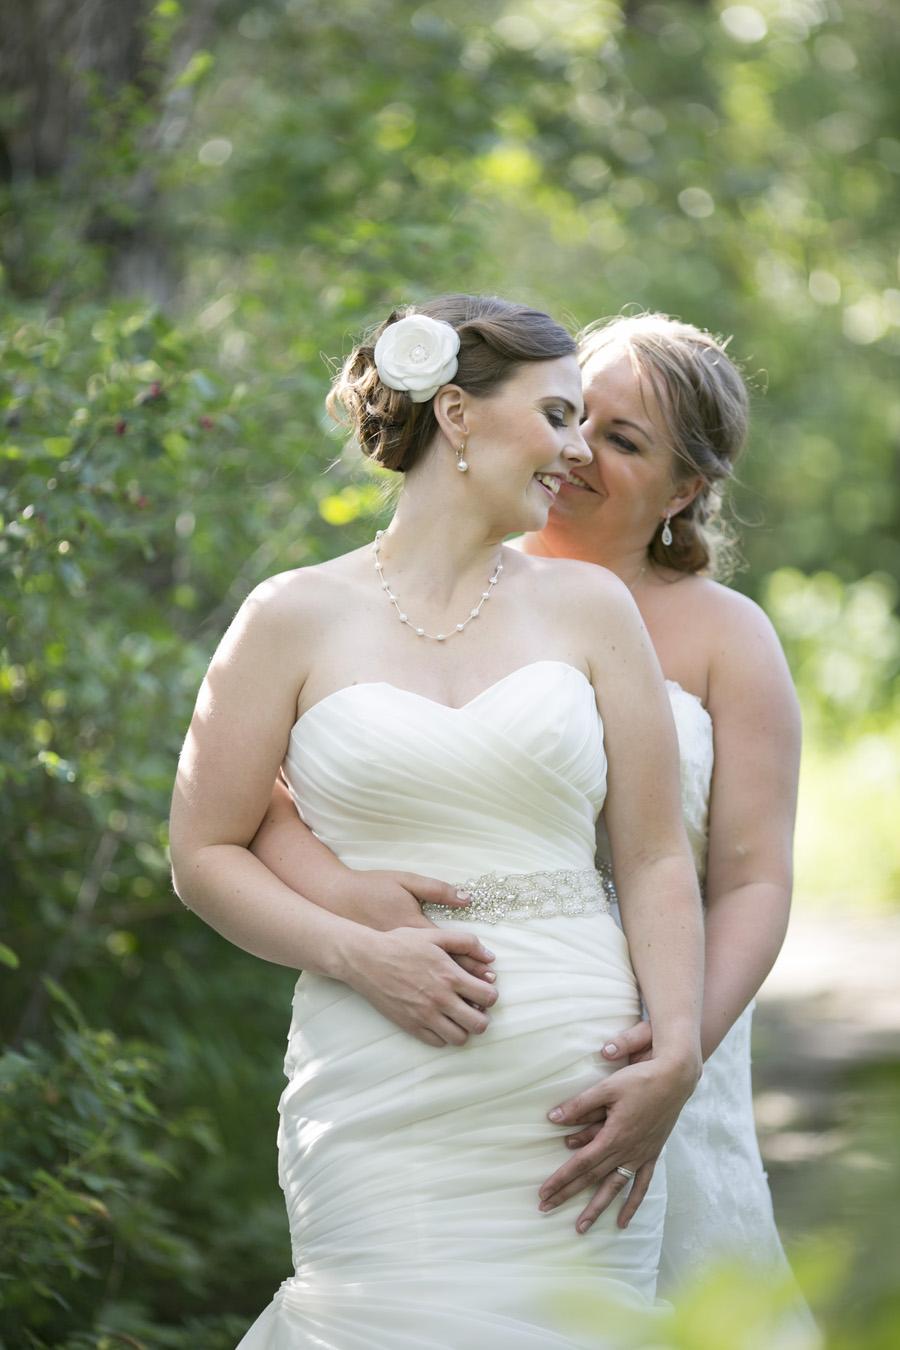 Jenn & Elise -married! {Calgary same-sex wedding photographer} - Modern Photography - Canmore